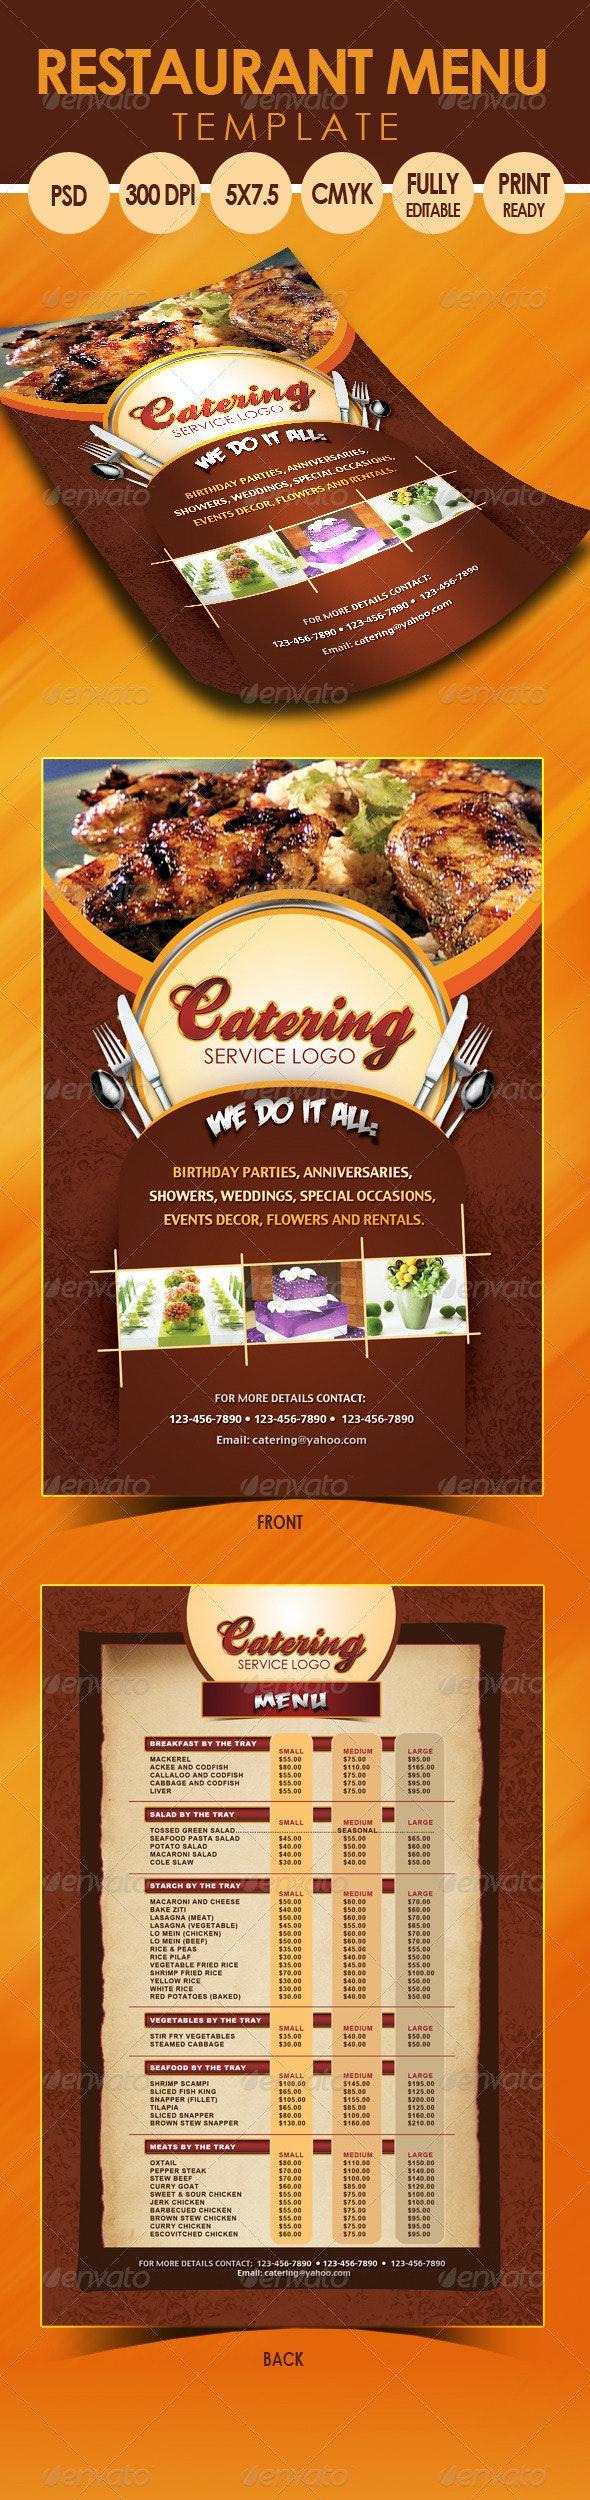 Catering Menu Template (Flyer) - Restaurant Flyers